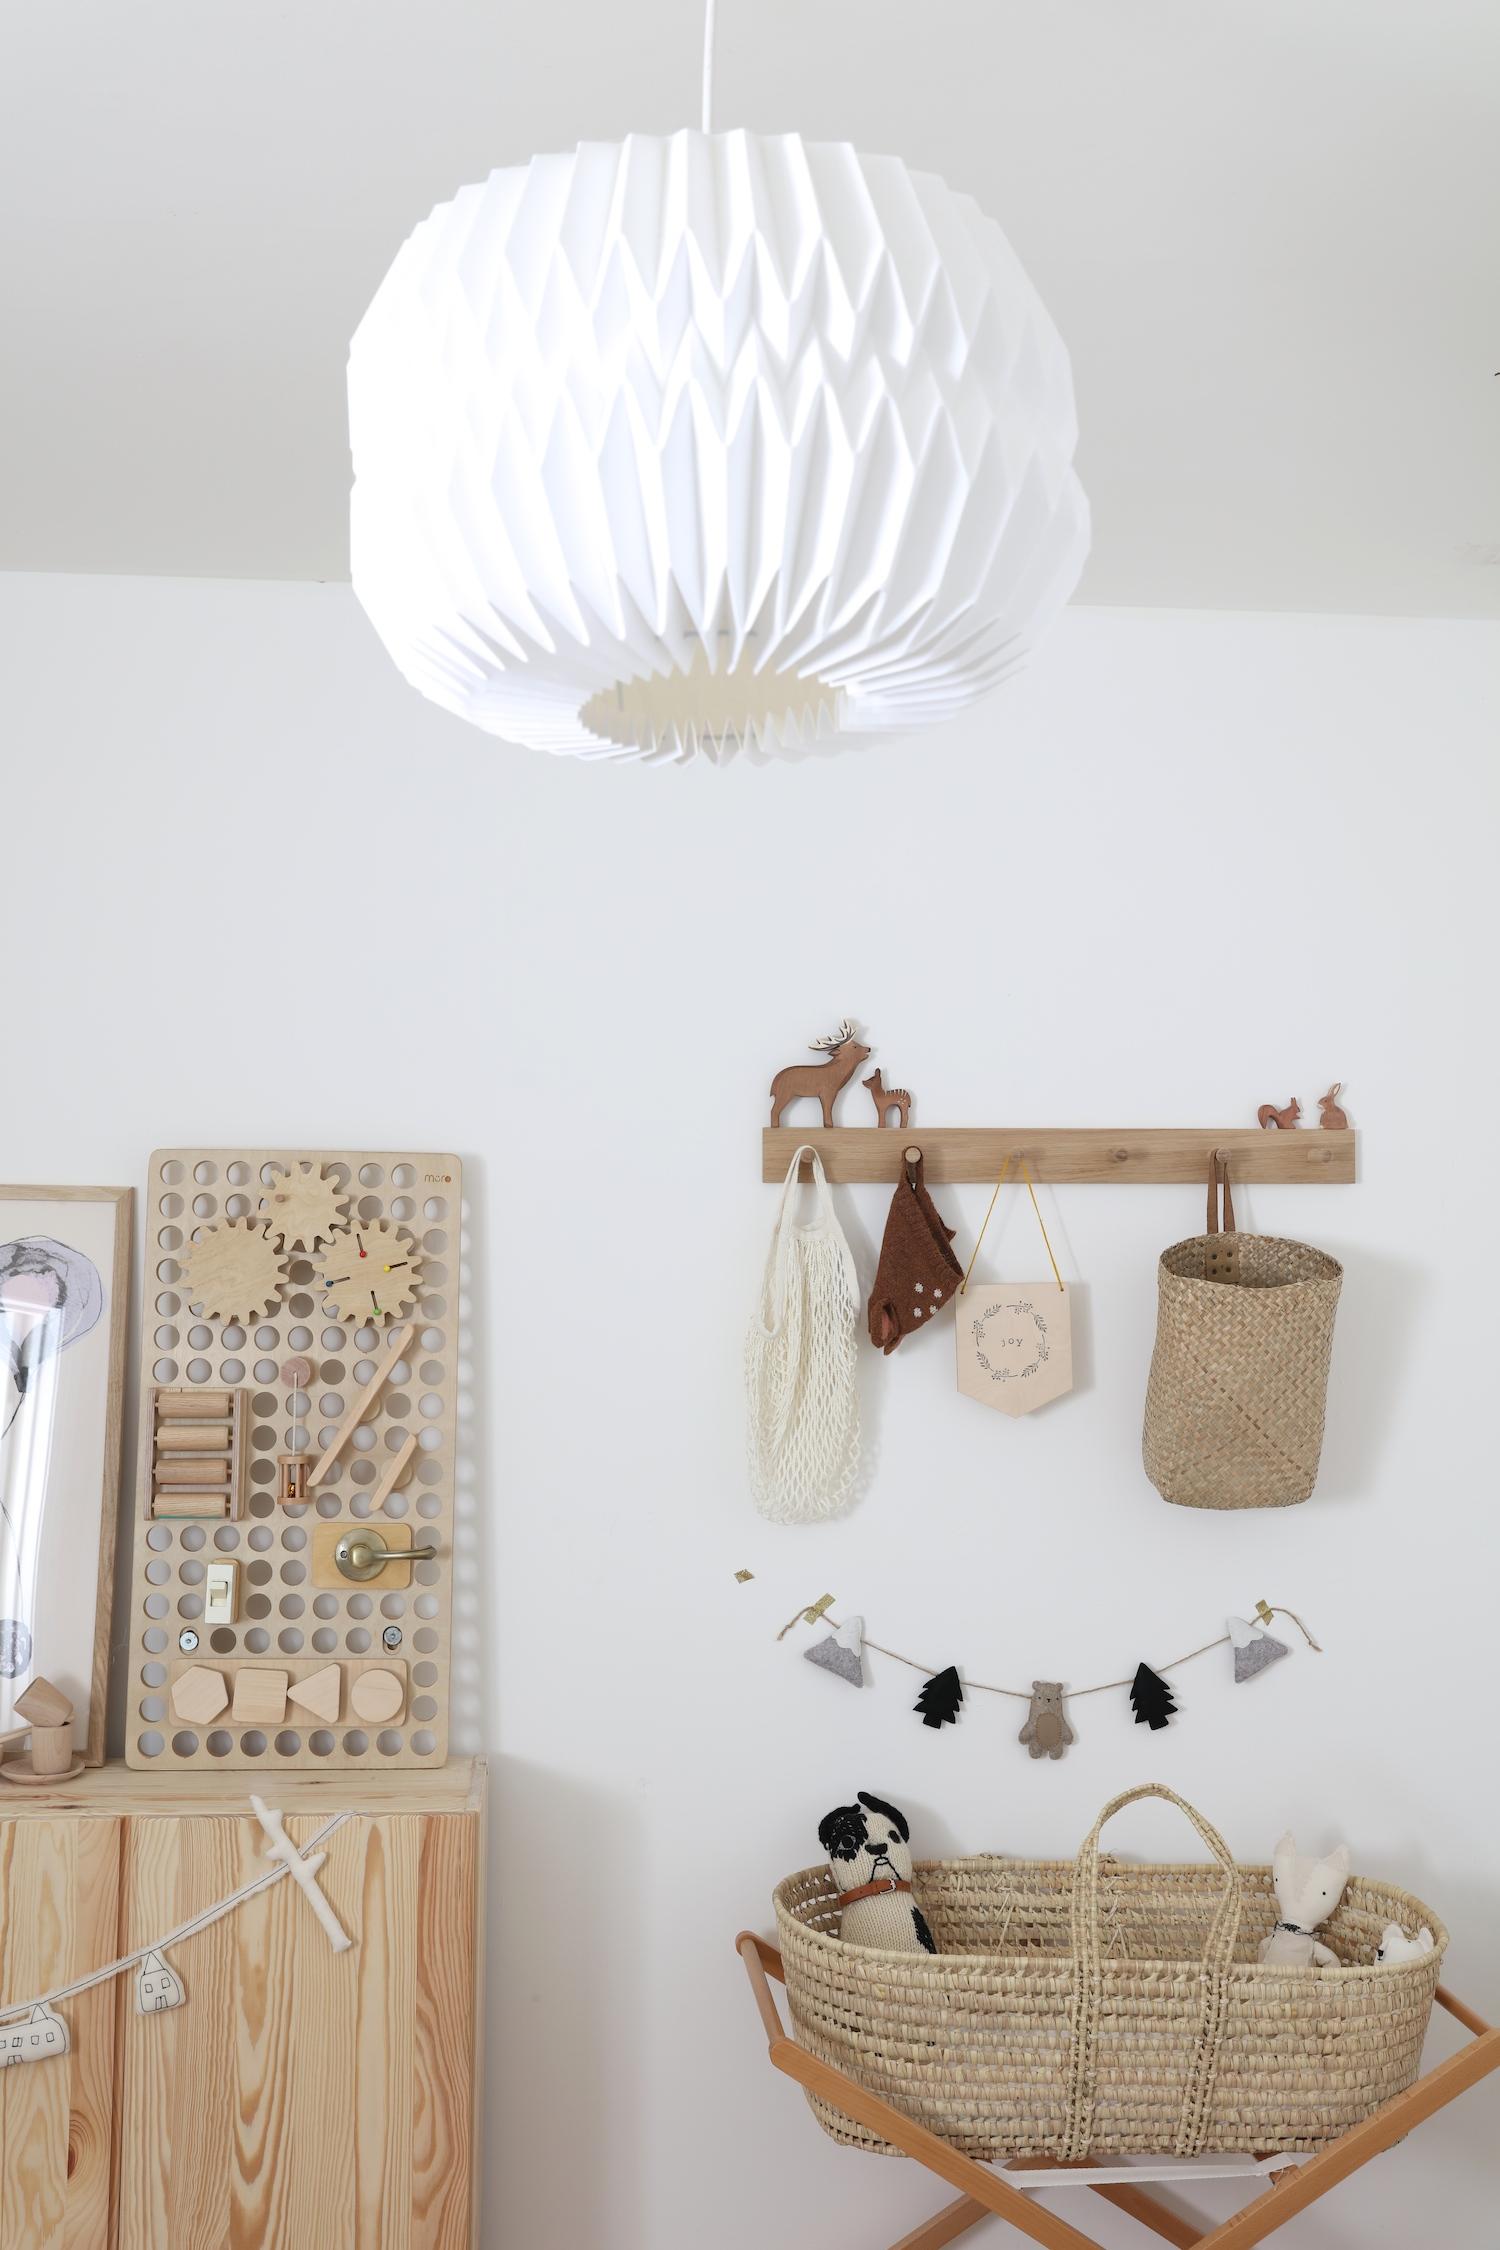 kickstarter_my_muro_sensory_board_wooden_baby